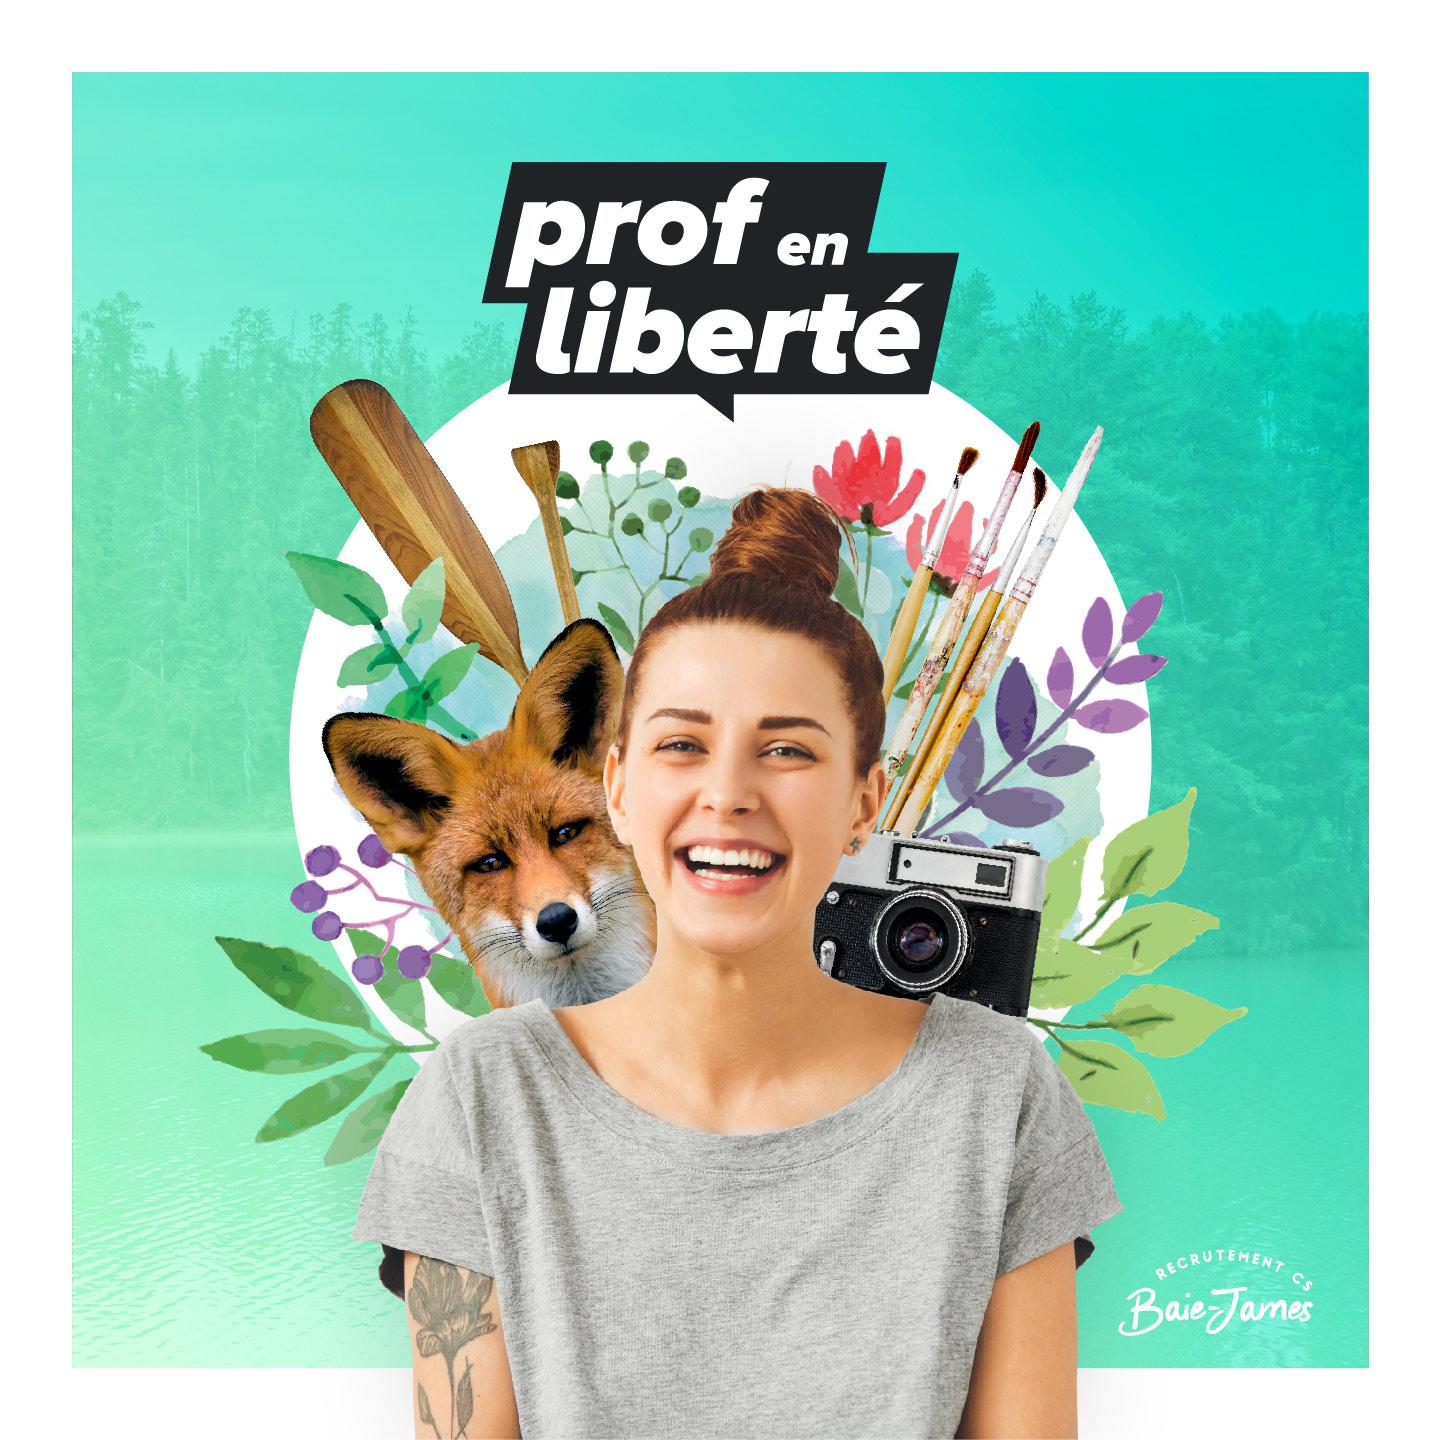 csbj-prof-en-liberte-02